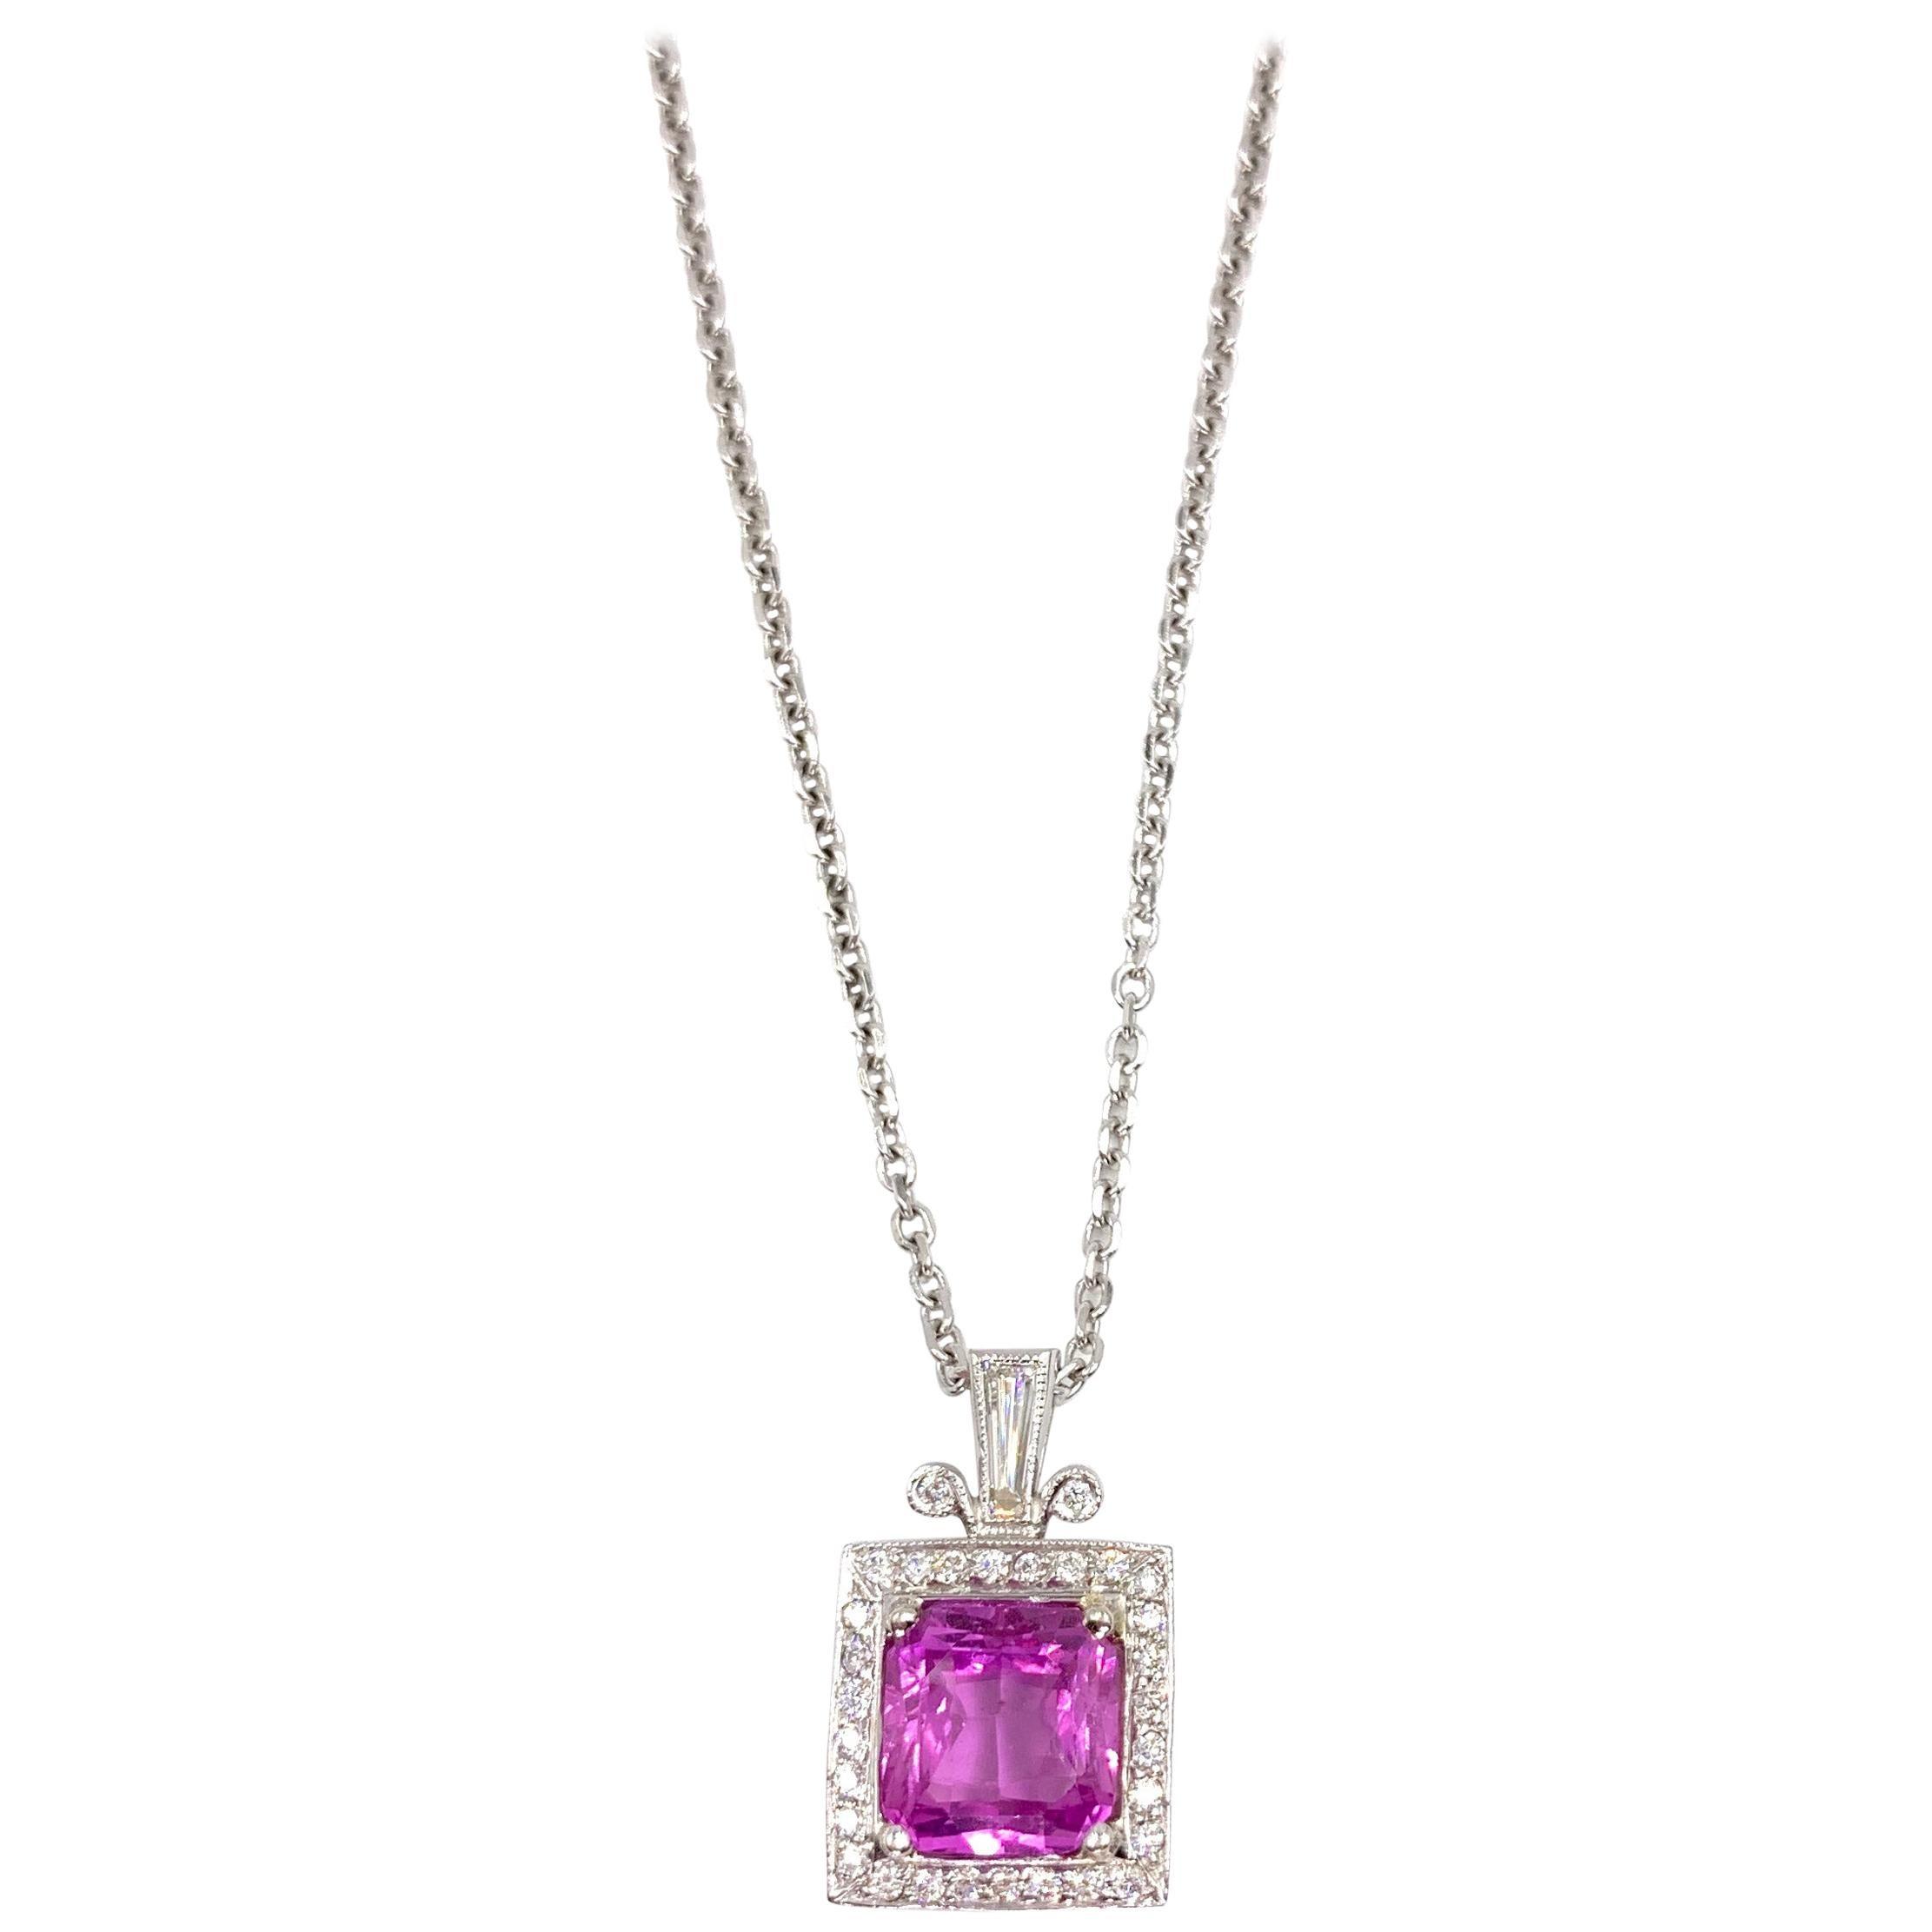 4.74 Carat Pink Sapphire and Diamond Pendant Necklace